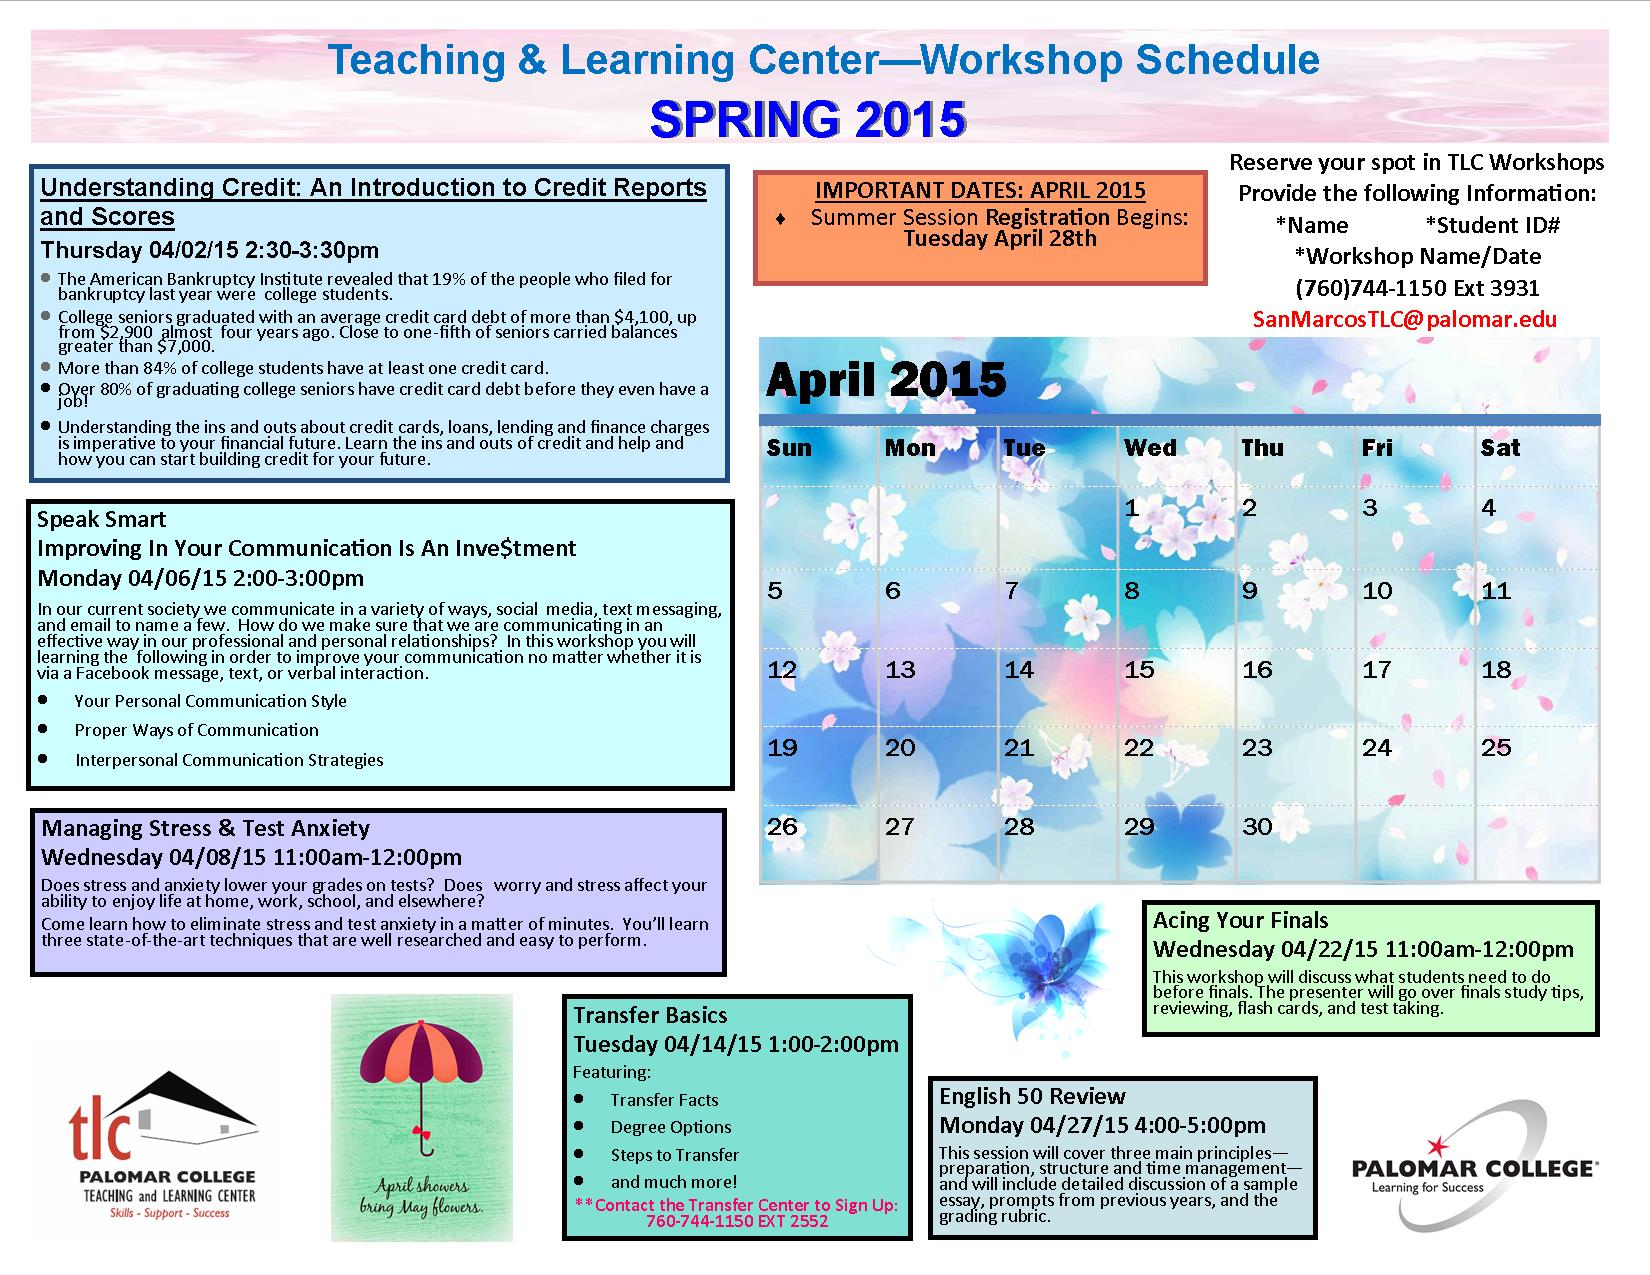 SP2015_TLC Workshop Schedule_April